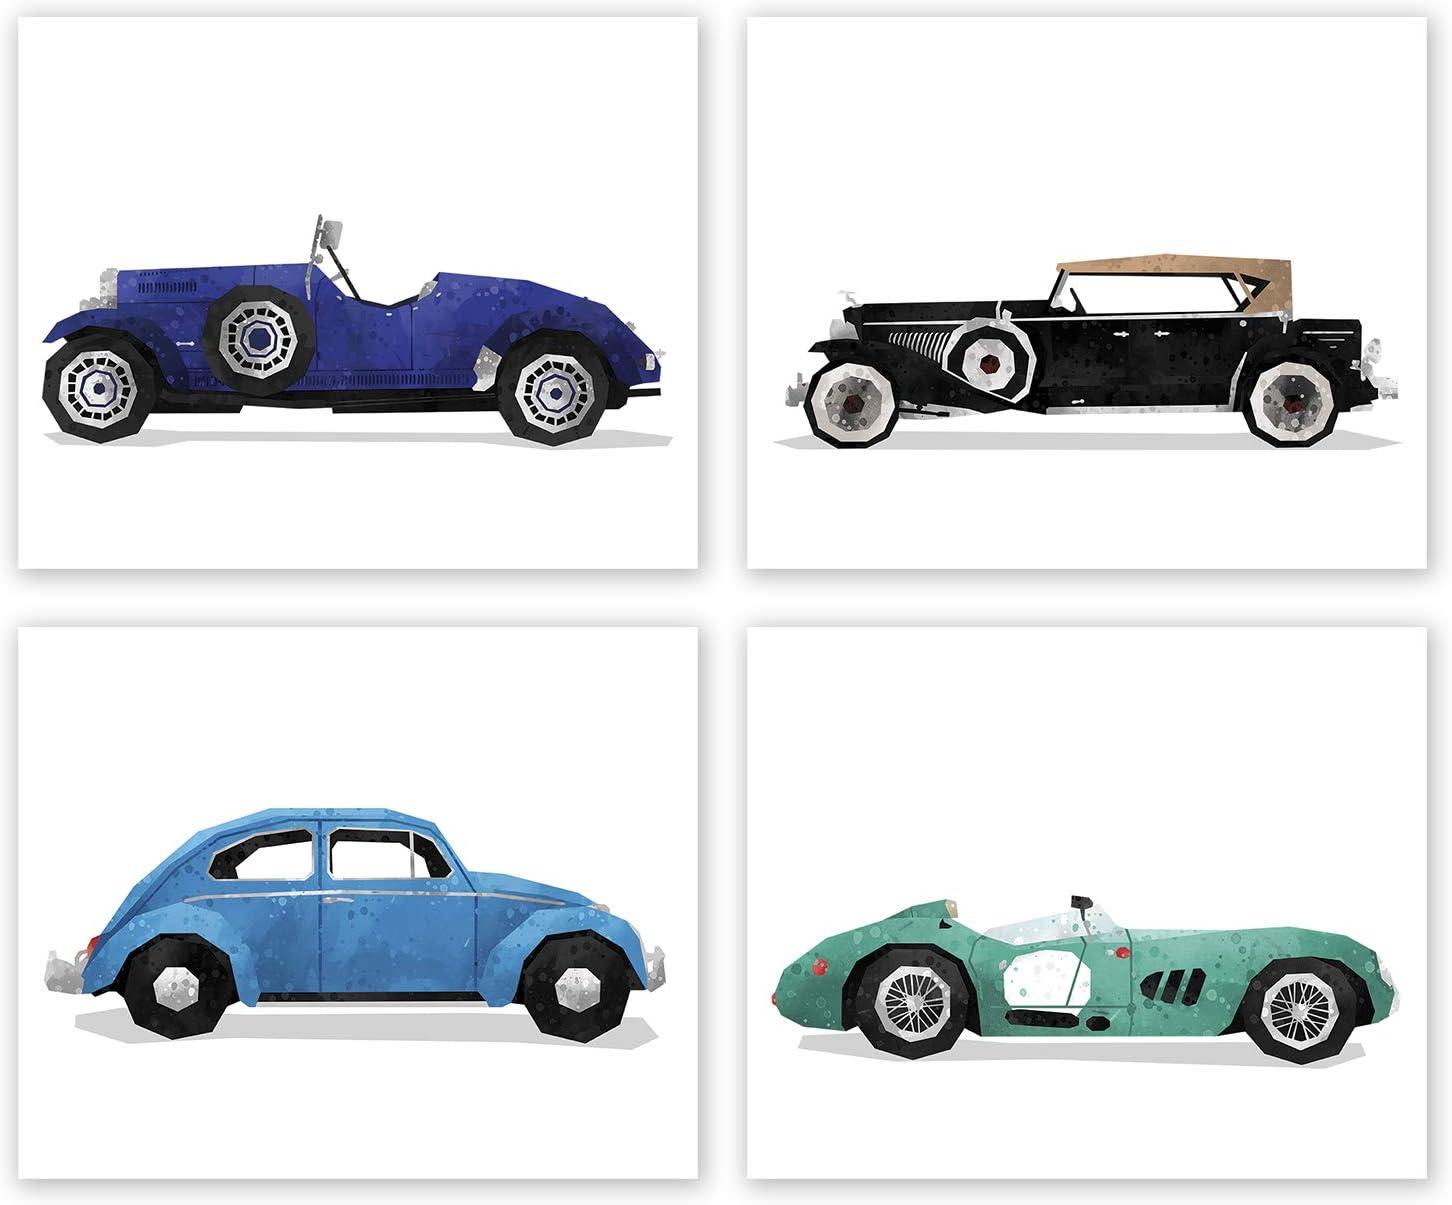 Car Wall Art - Set of 4 Posters // Retro Sport Car Prints // Game Room Wall Decor Pictures // Race Car Art // Boy Bedroom Decor // Playroom Automobile Illustration (8x10, Set 4 Retro Sp)